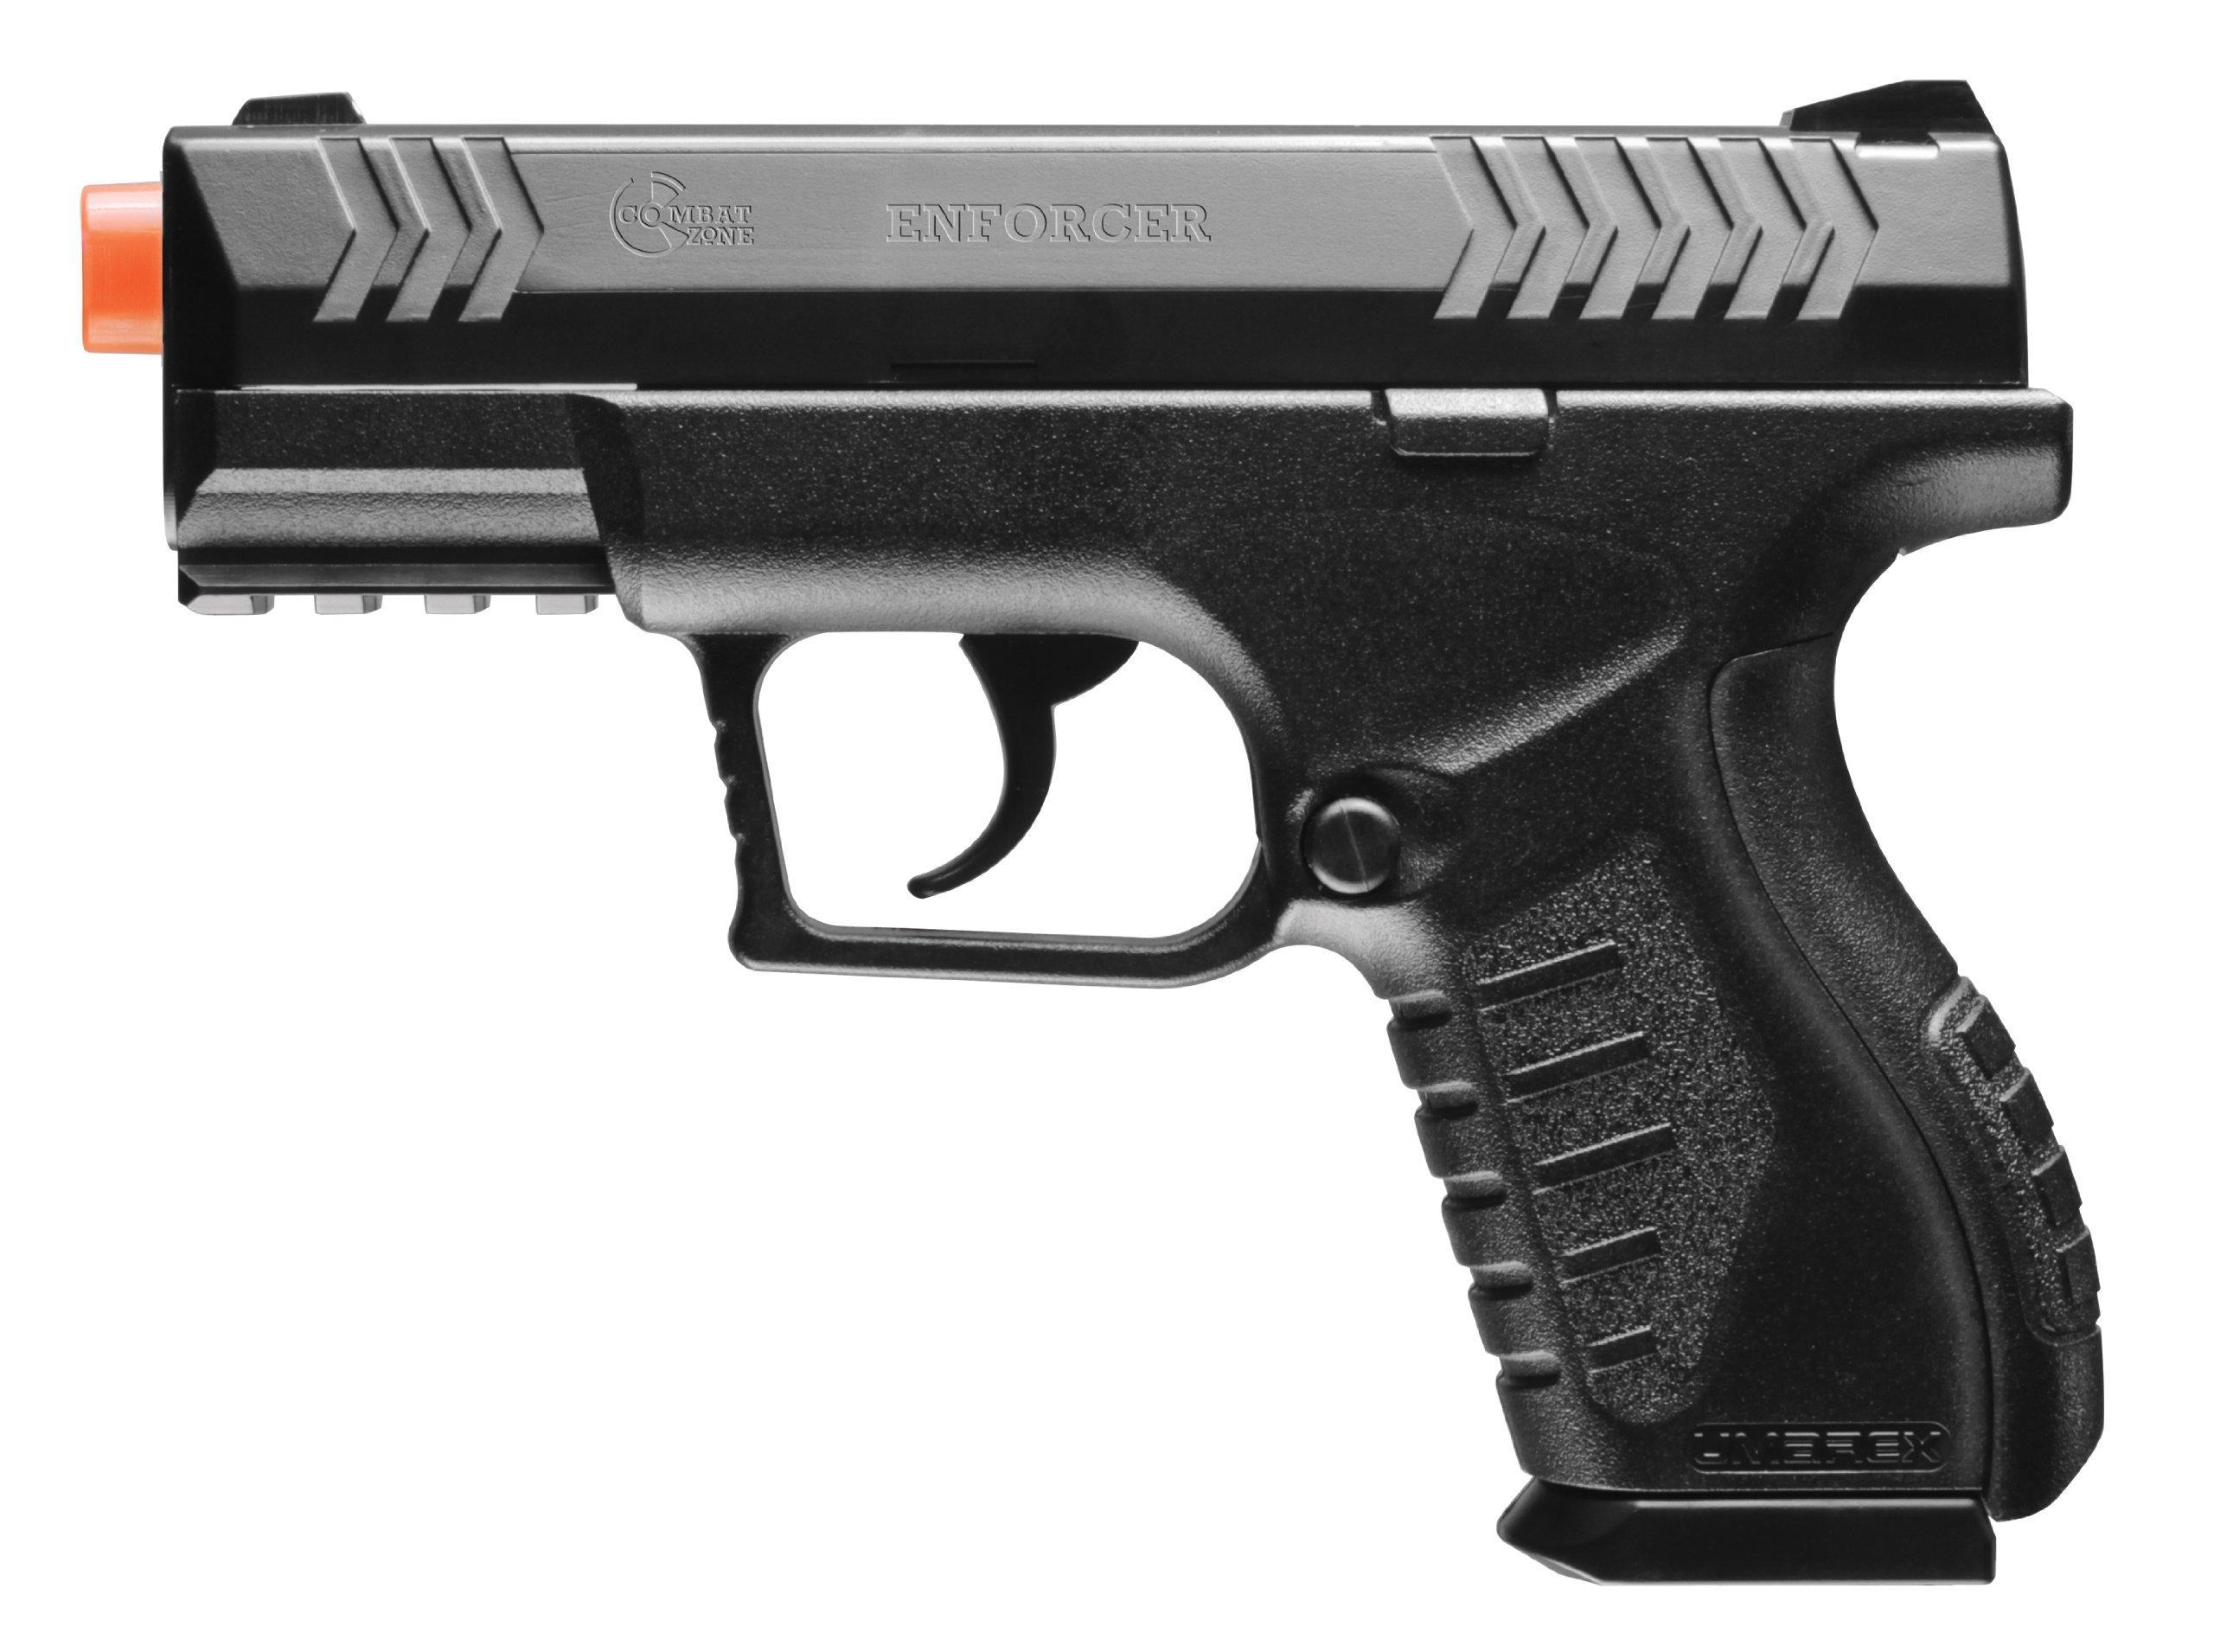 Umarex Combat Zone Enforcer .6mm Airsoft